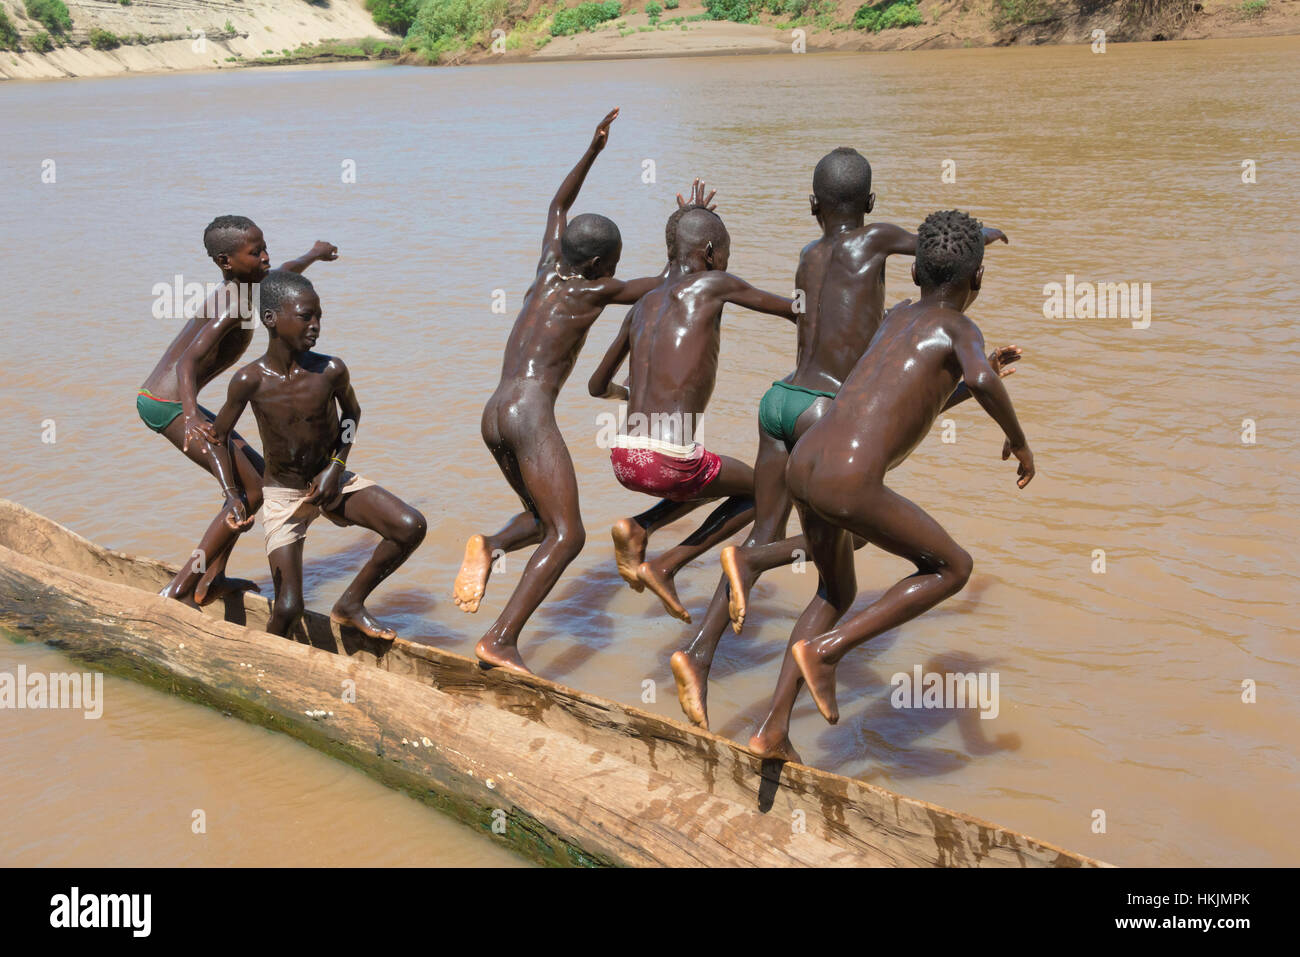 Kara tribe boys on dugout canoe on Lower Omo River, South Omo, Ethiopia - Stock Image